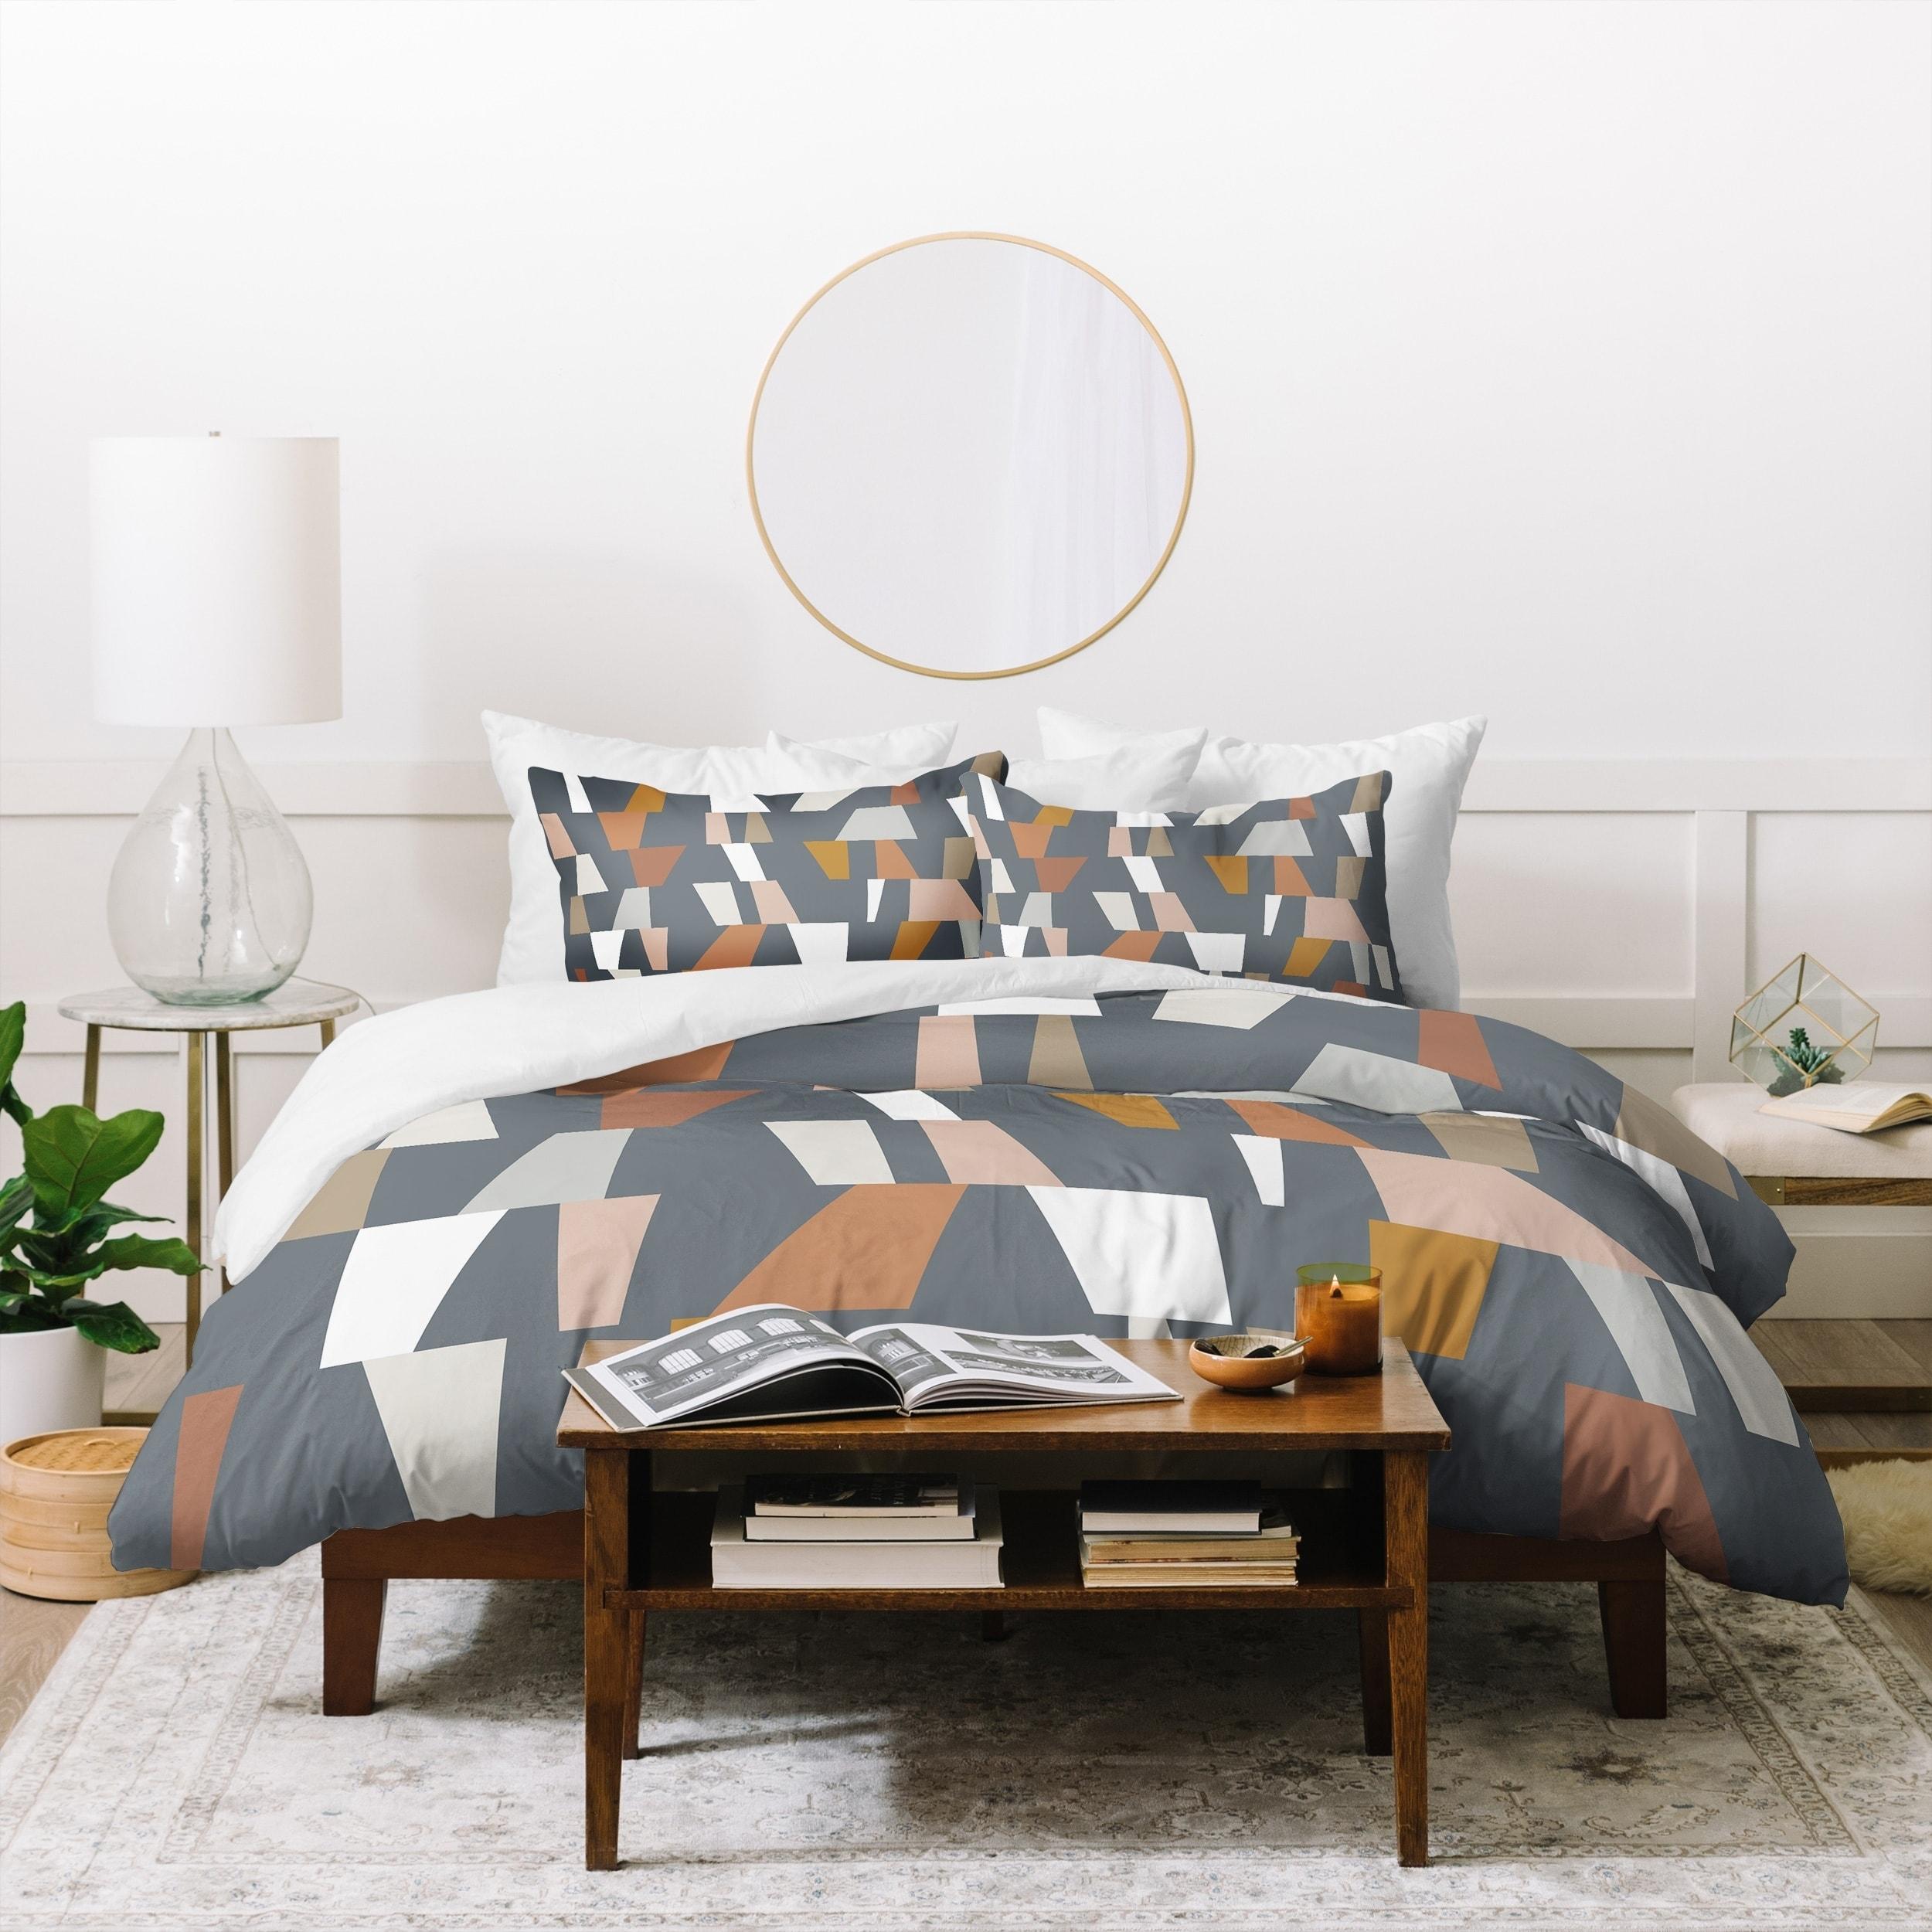 Deny Designs Neutral Geometric Duvet Cover Set 3 Piece Set Overstock 21453921